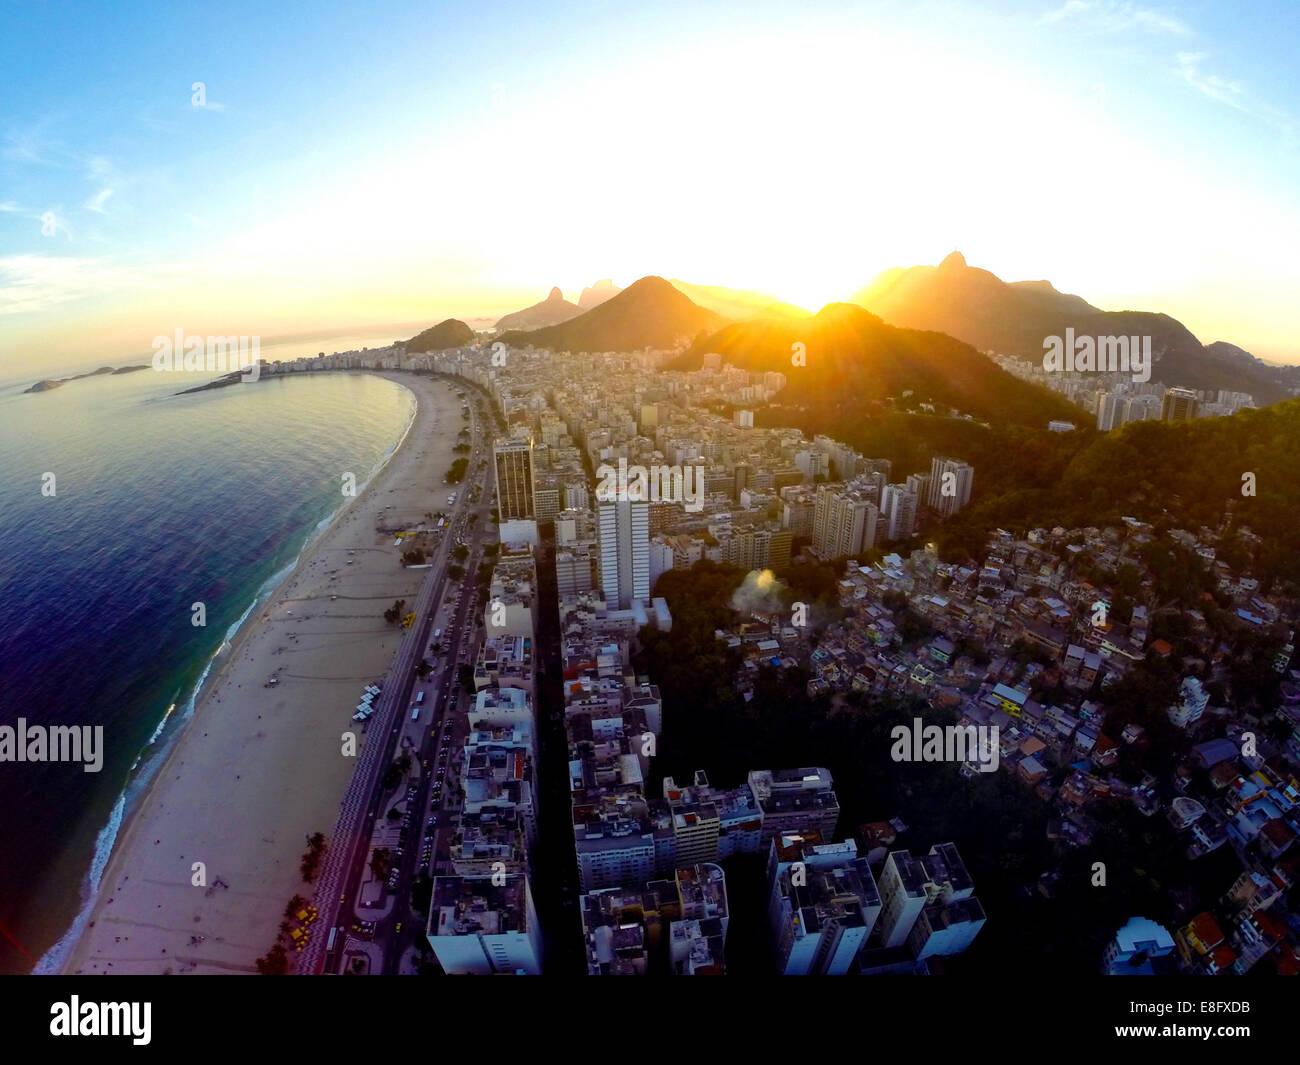 Brasil, Rio de Janeiro, vista aérea de la playa de Copacabana al atardecer Imagen De Stock